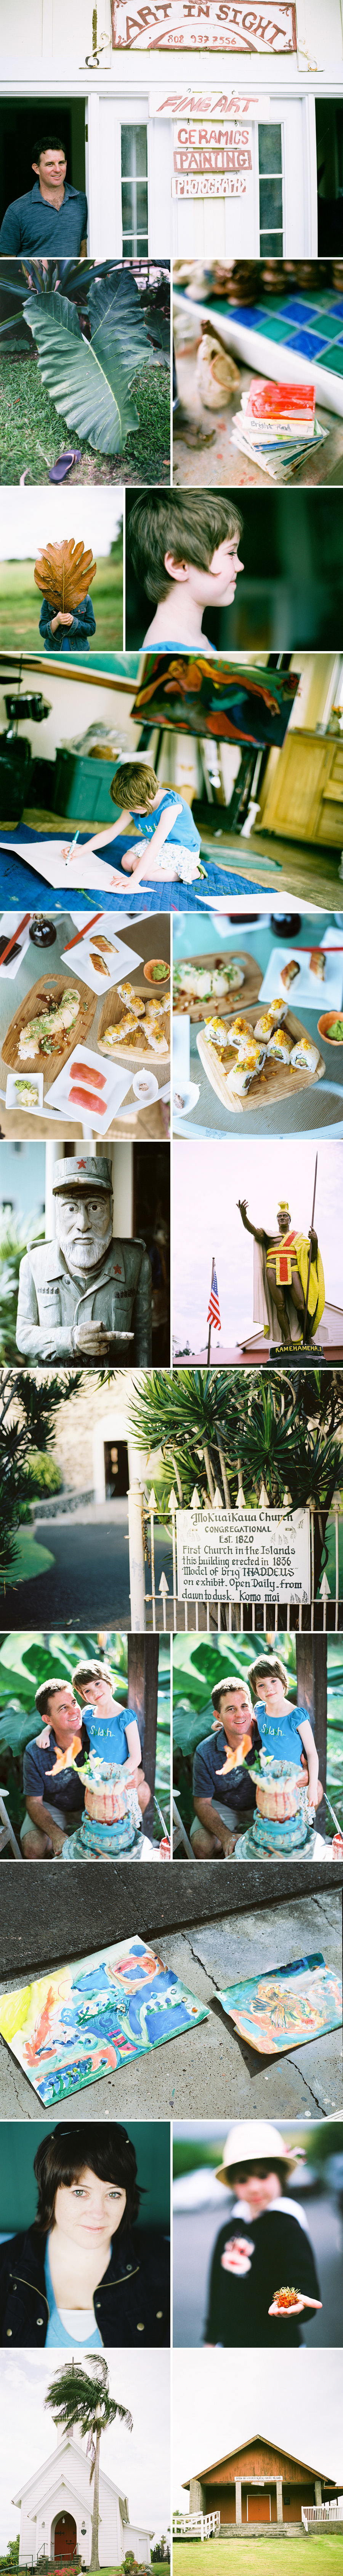 Hawaiian travel photography of artist Peter Antrim Kowalke, his Art In Sight studio, sushi from Sushi Rock in Hawi, statue of King Kamehameha and Mokuaikaua Church.